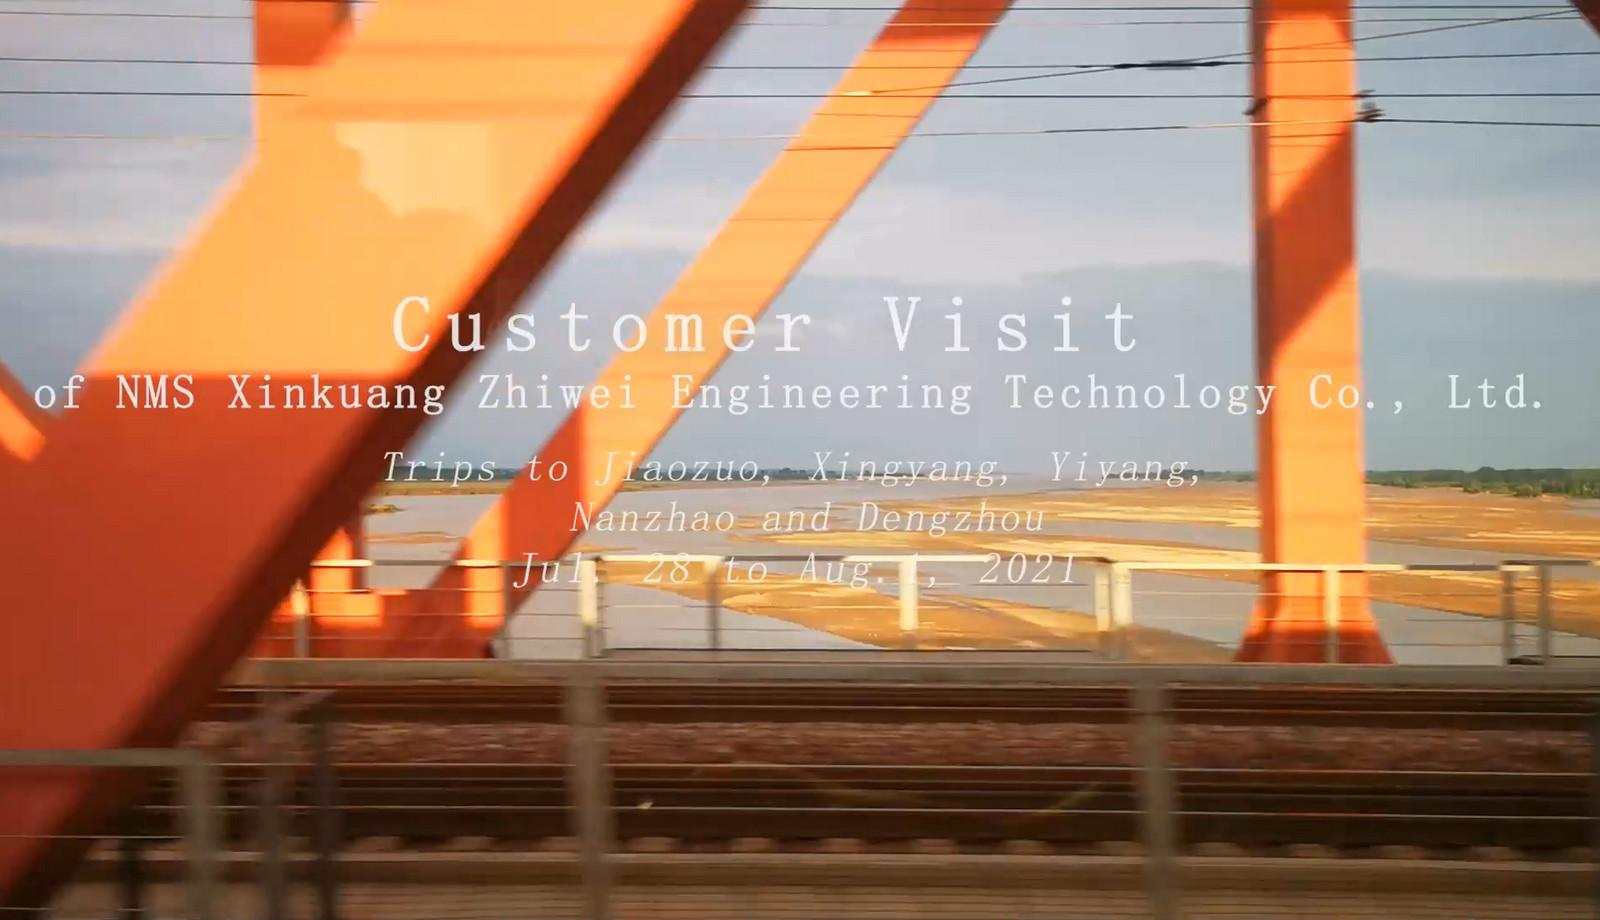 Customer Visit of NMS Xinkuang Zhiwei Engineering Technology